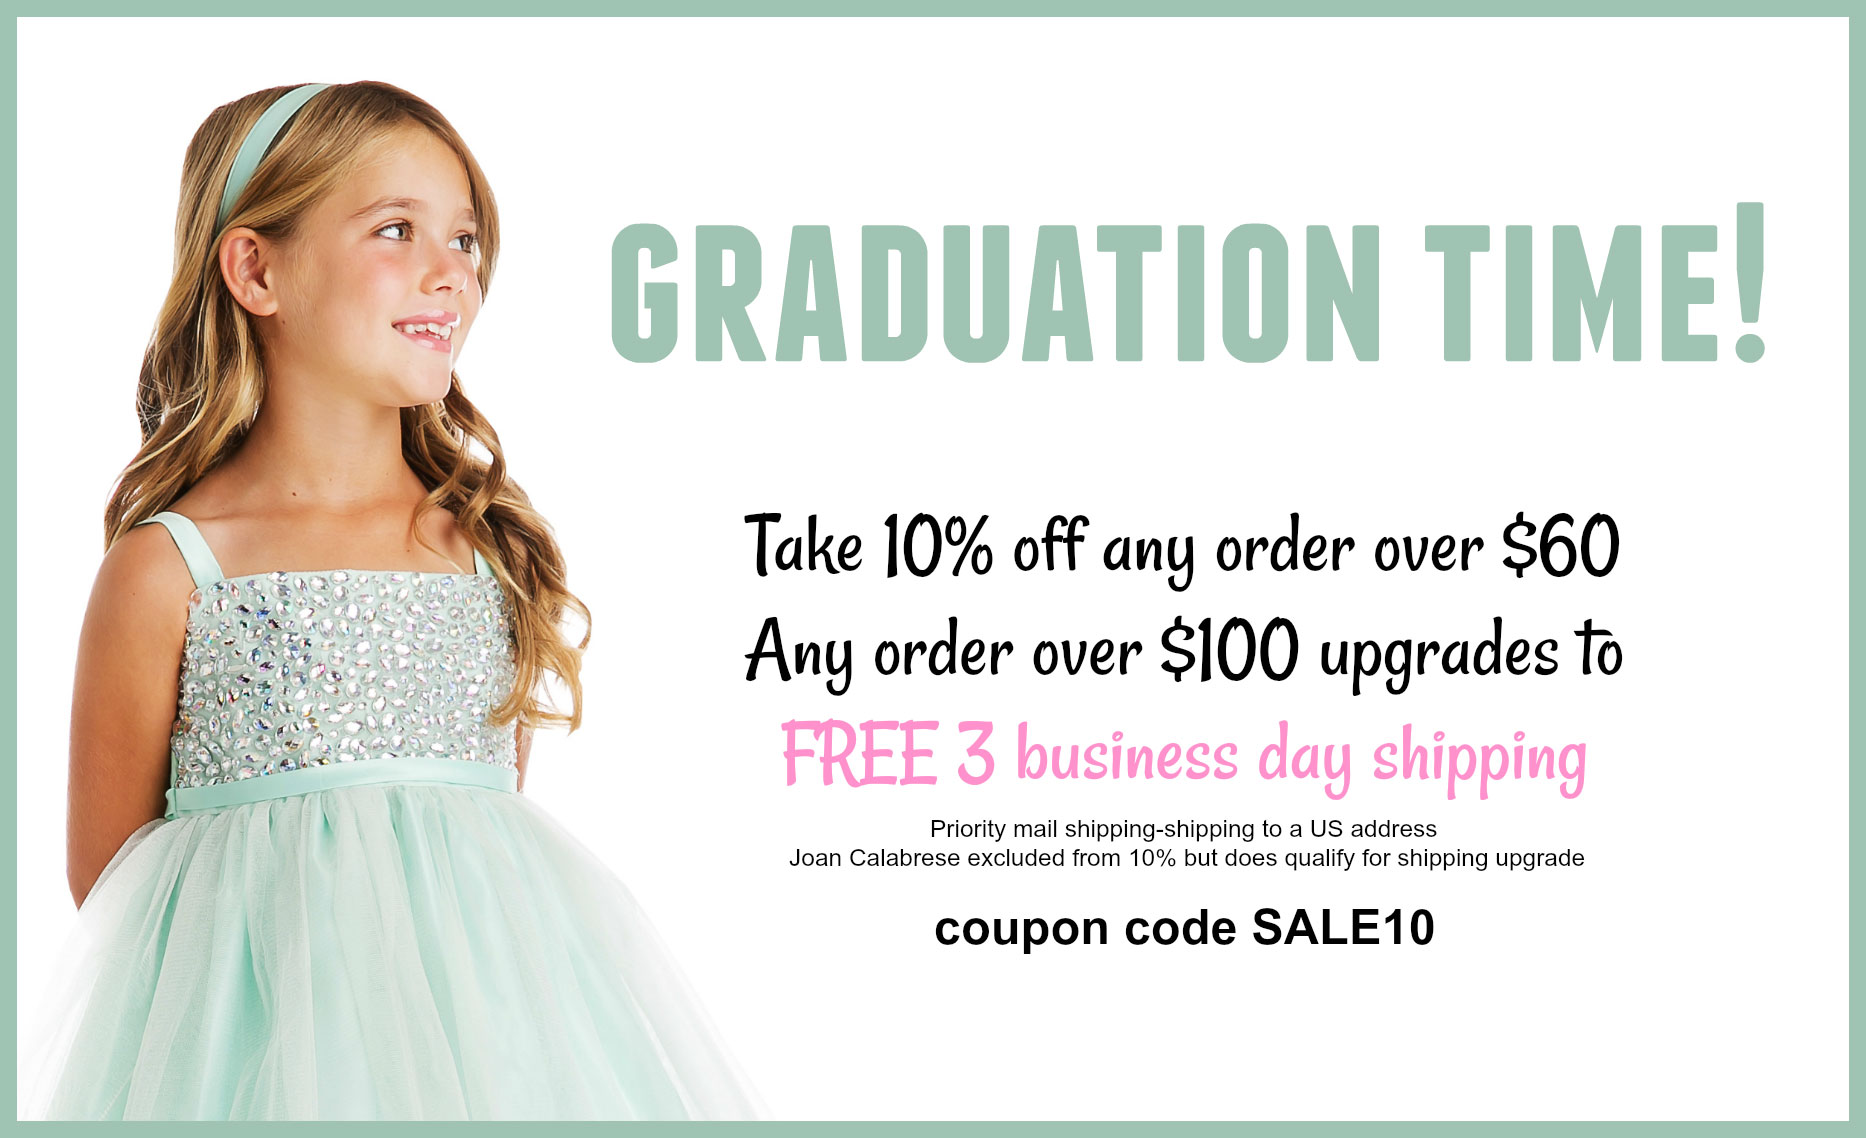 Flower girl dresses flower girl dress for less 2018 graduation outfits for kids izmirmasajfo Choice Image